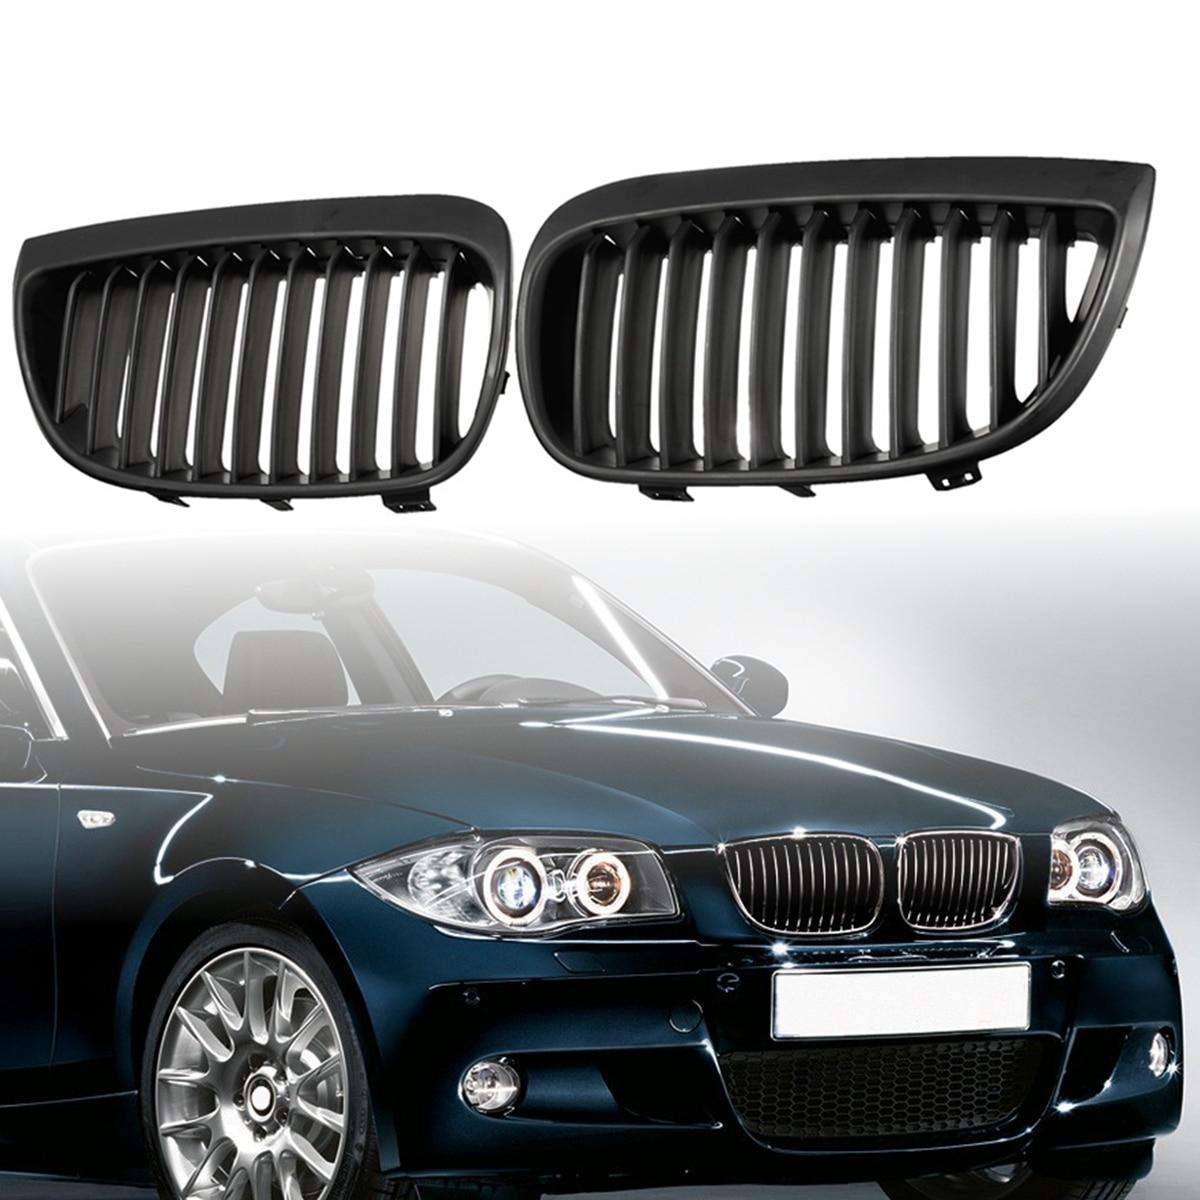 Pair Matte black/Matte black M/Gloss Black /Gloss Black M Front Sport Kidney Grill Grilles for BMW E87/E81 1 Series 2004-2007